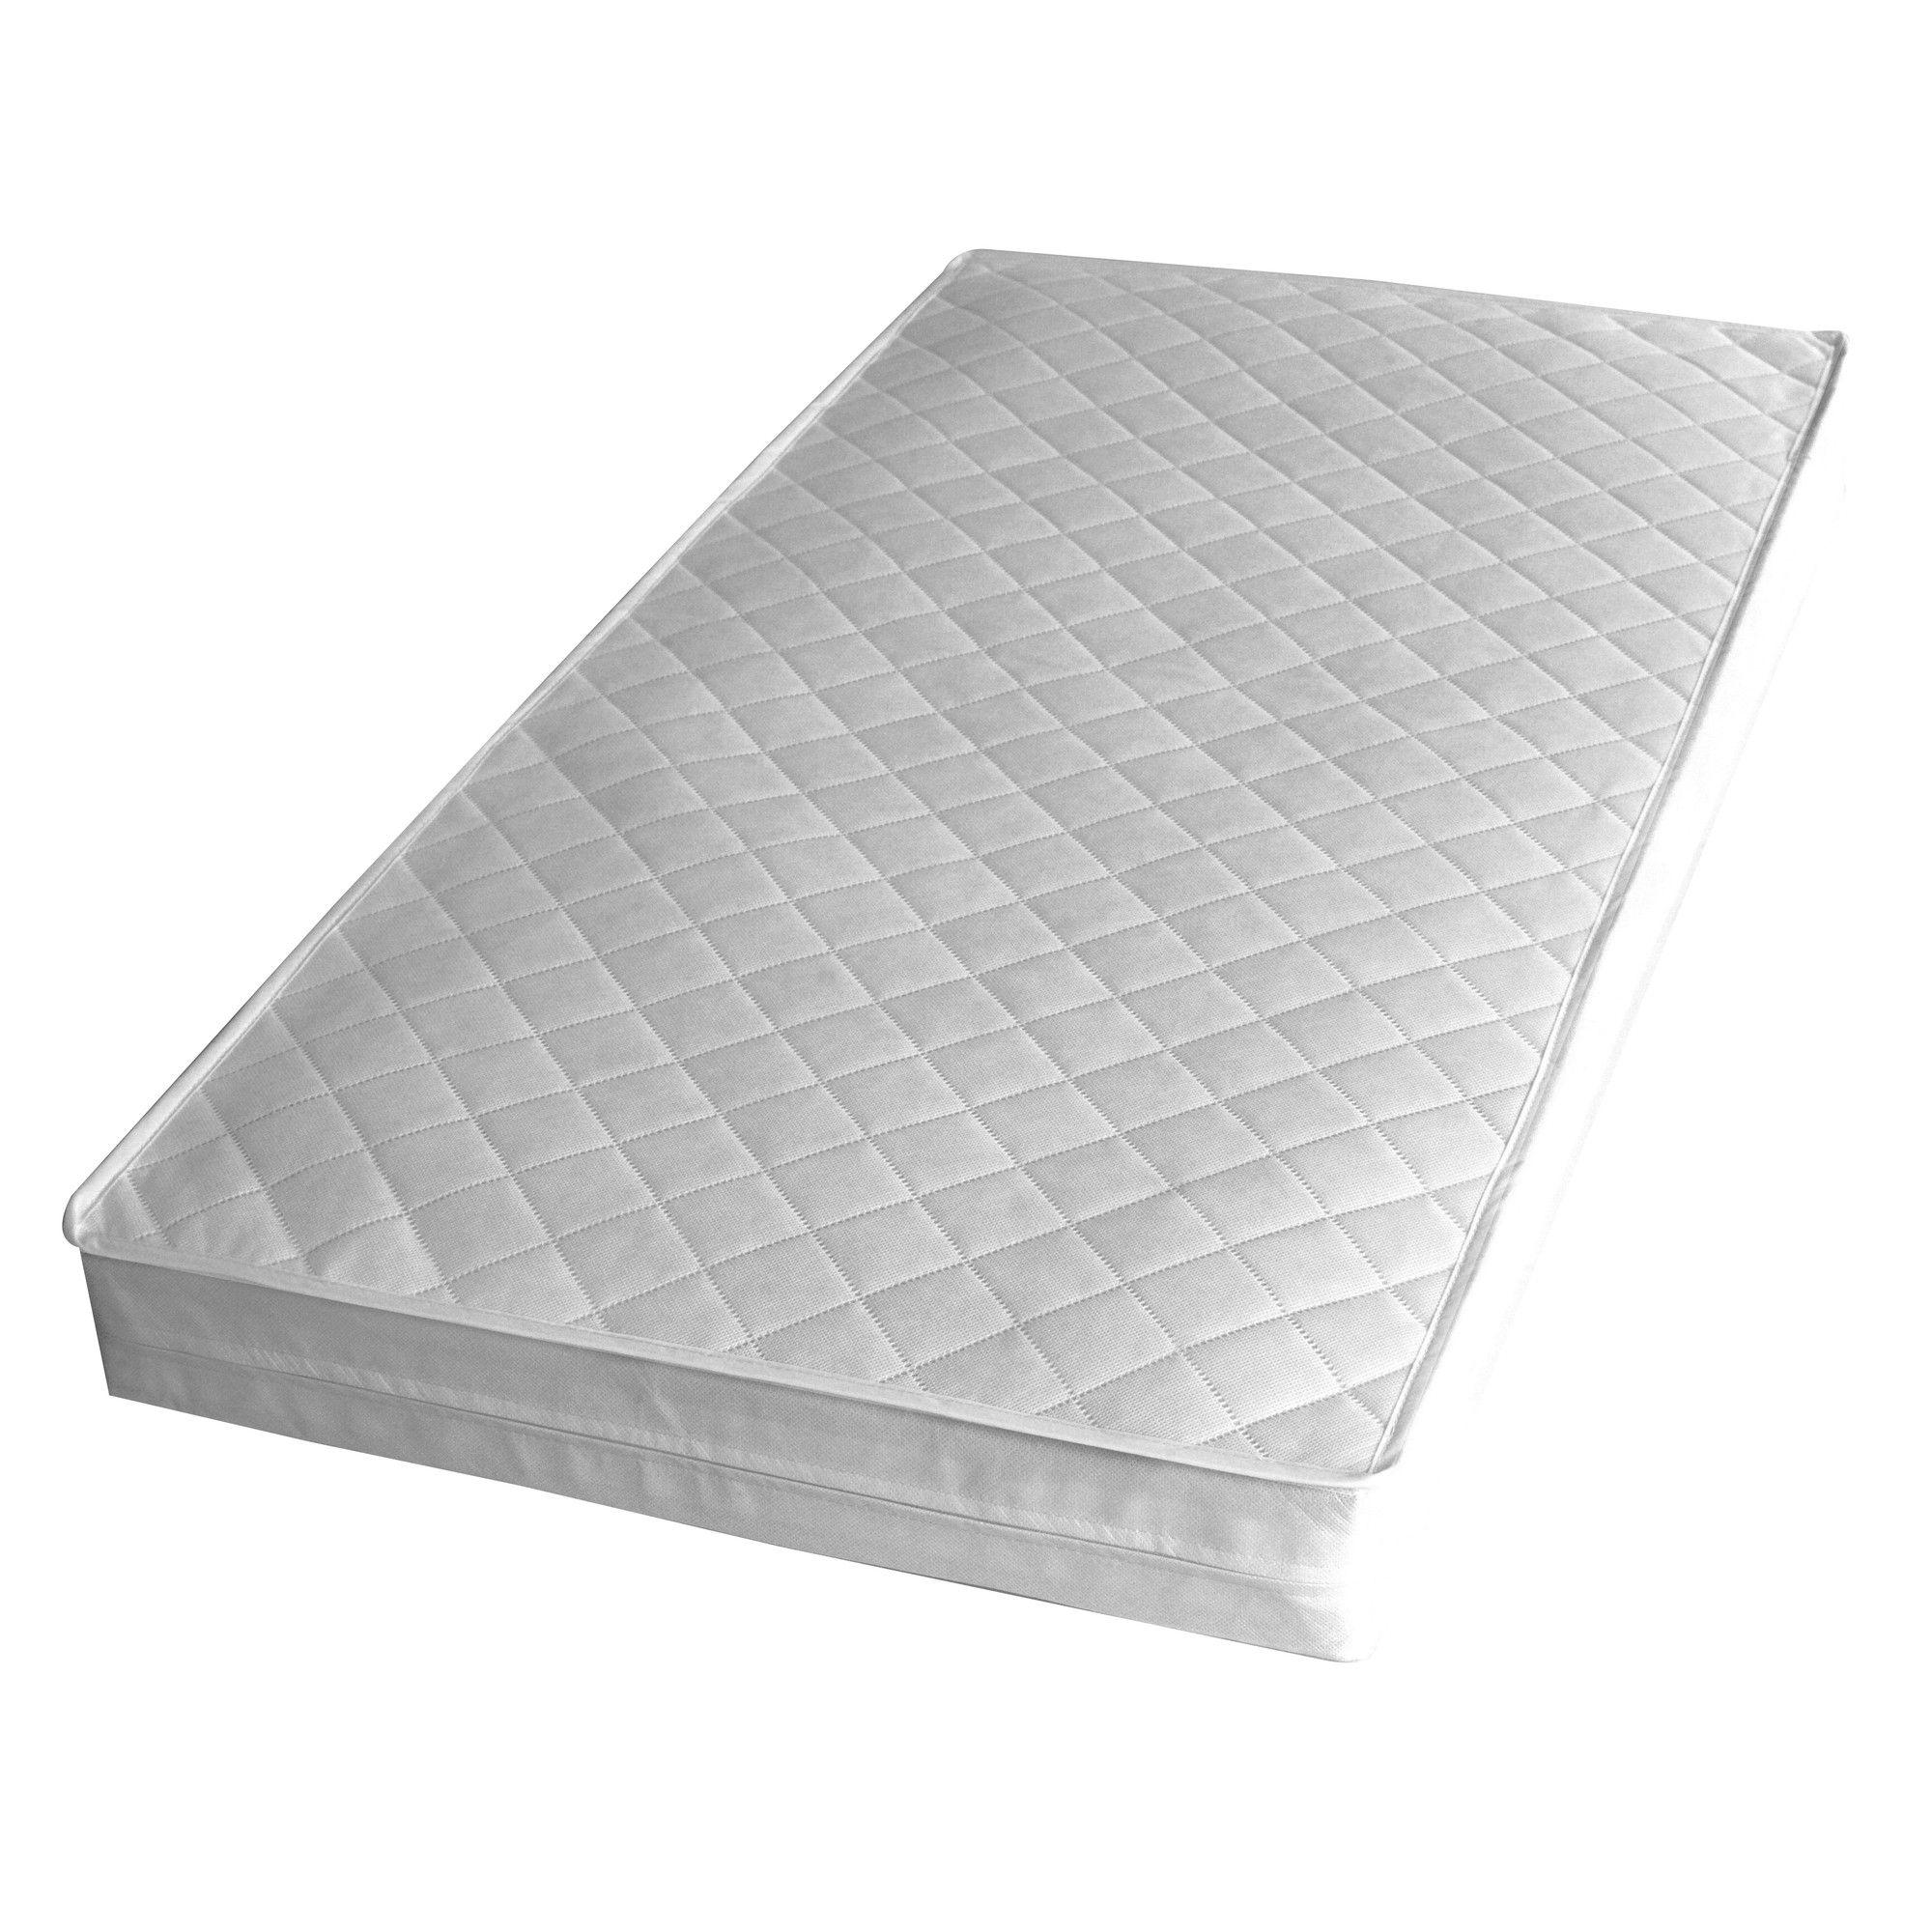 Kit For Kids Baby Foam Kidtex Crib Travel Mattress Folding Cot